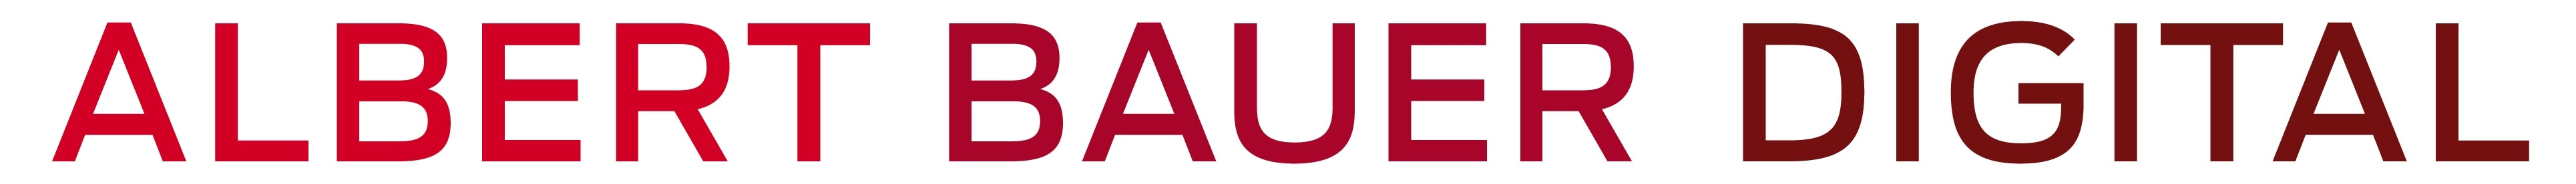 Albert Bauer Digital GmbH & Co. KG